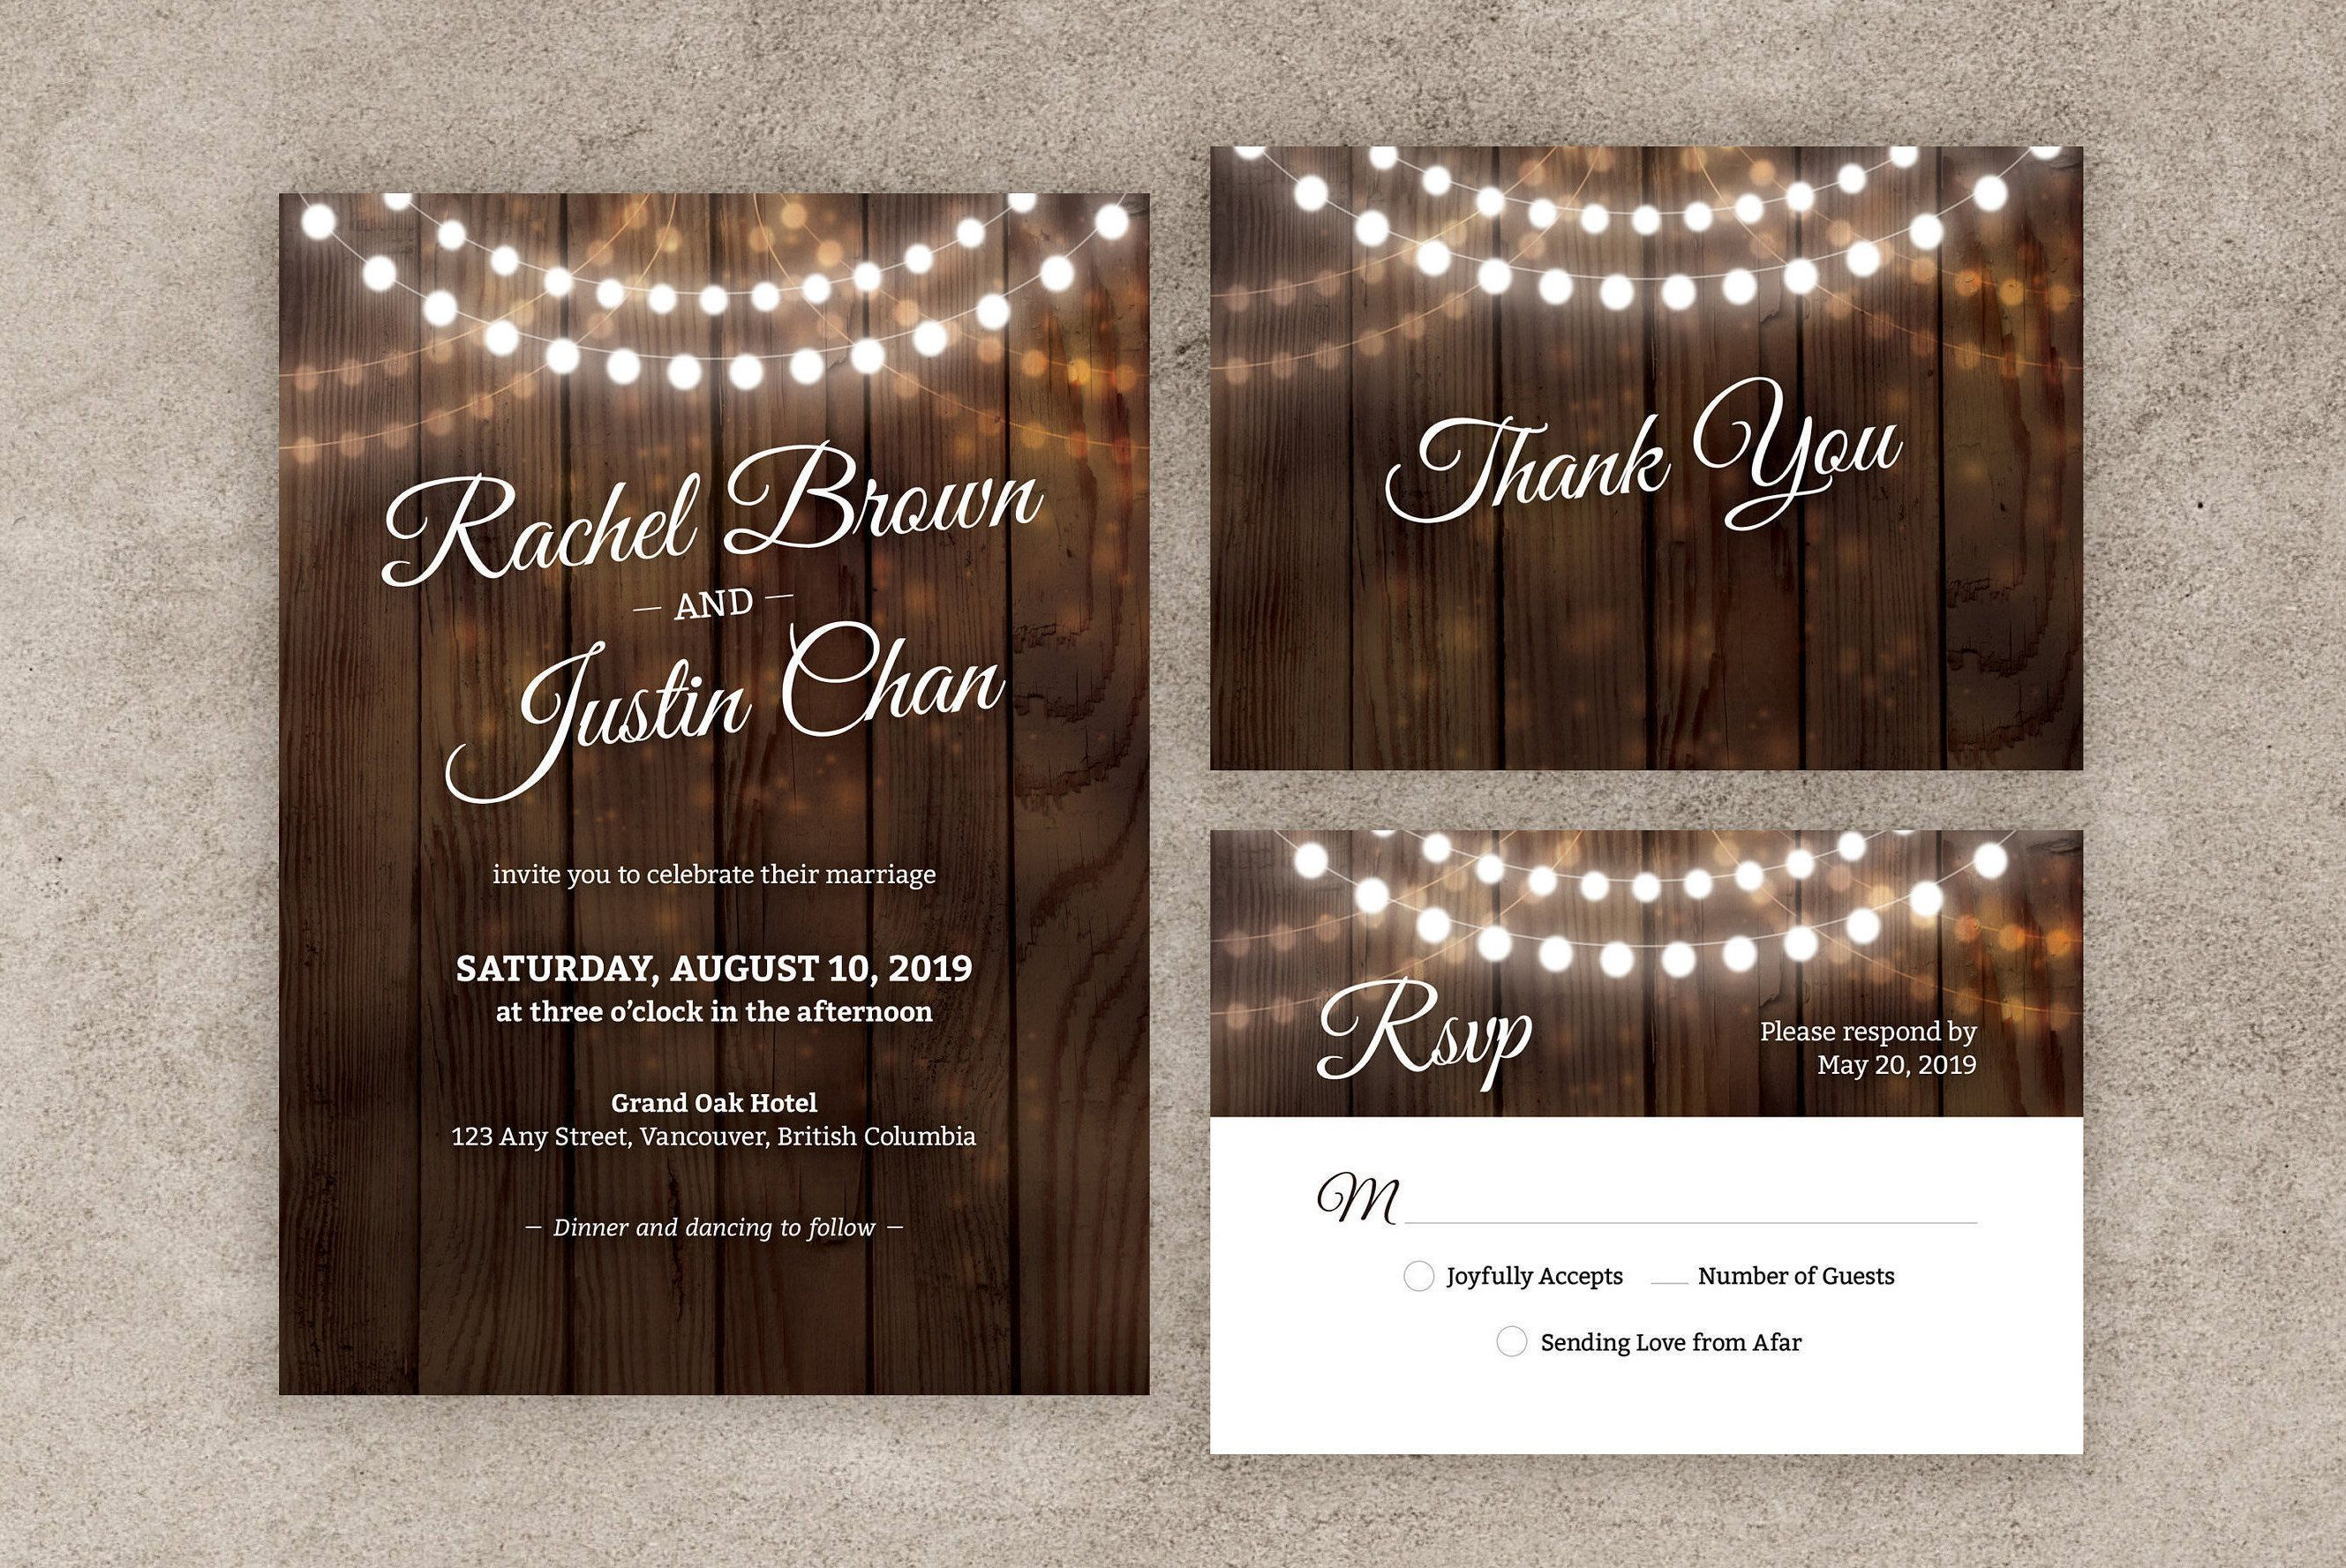 Rustic Wedding Invitation Templates Suite Diy Ru Wedding Invitation Templates Rustic Wedding Invitations Printable Templates Free Wedding Invitation Templates